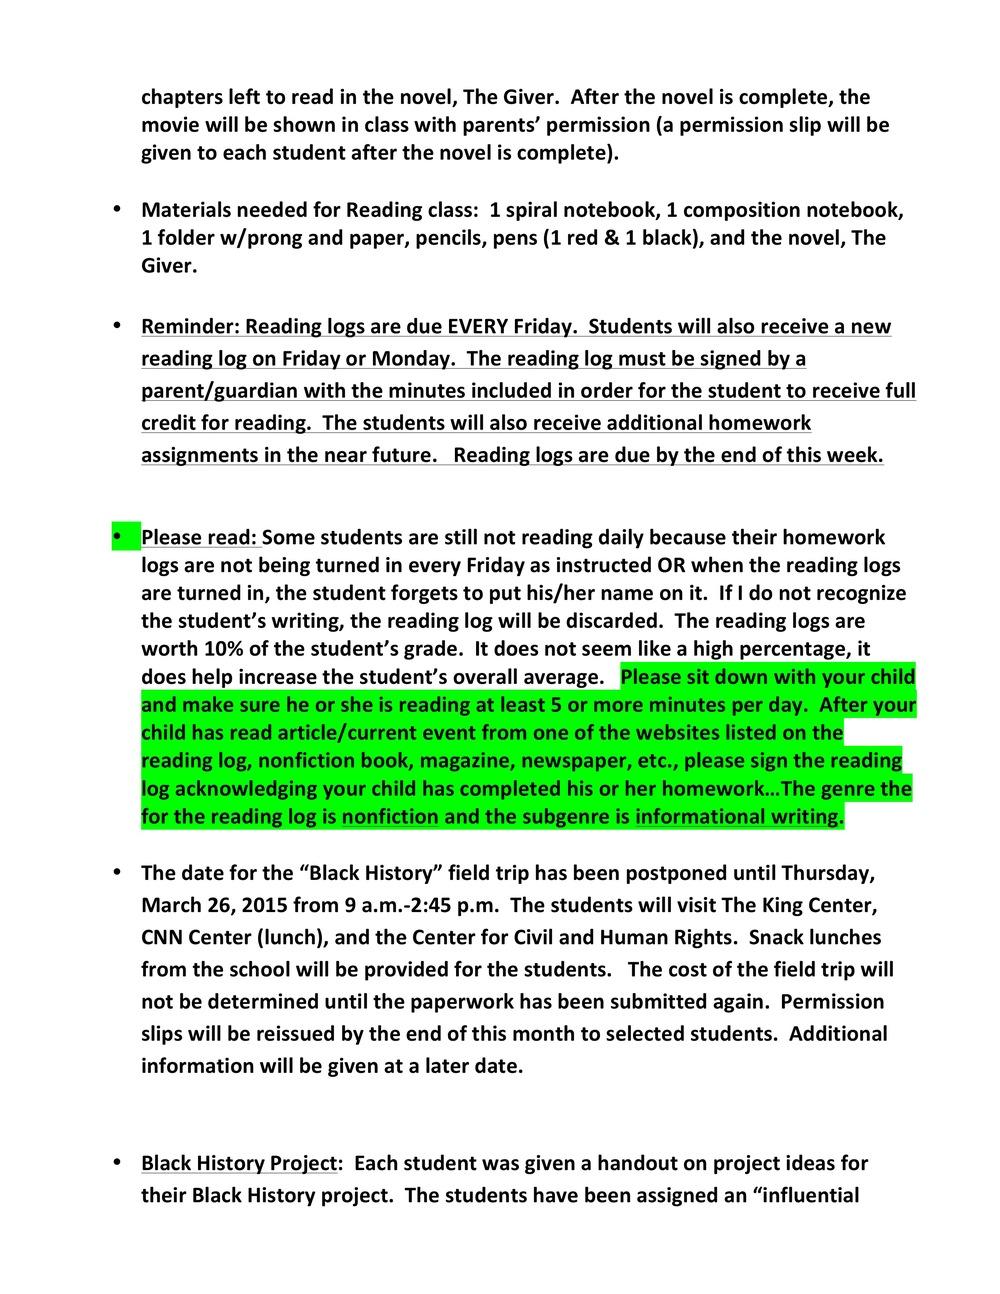 Newsletter Image7th grade feb 16th 3.jpeg